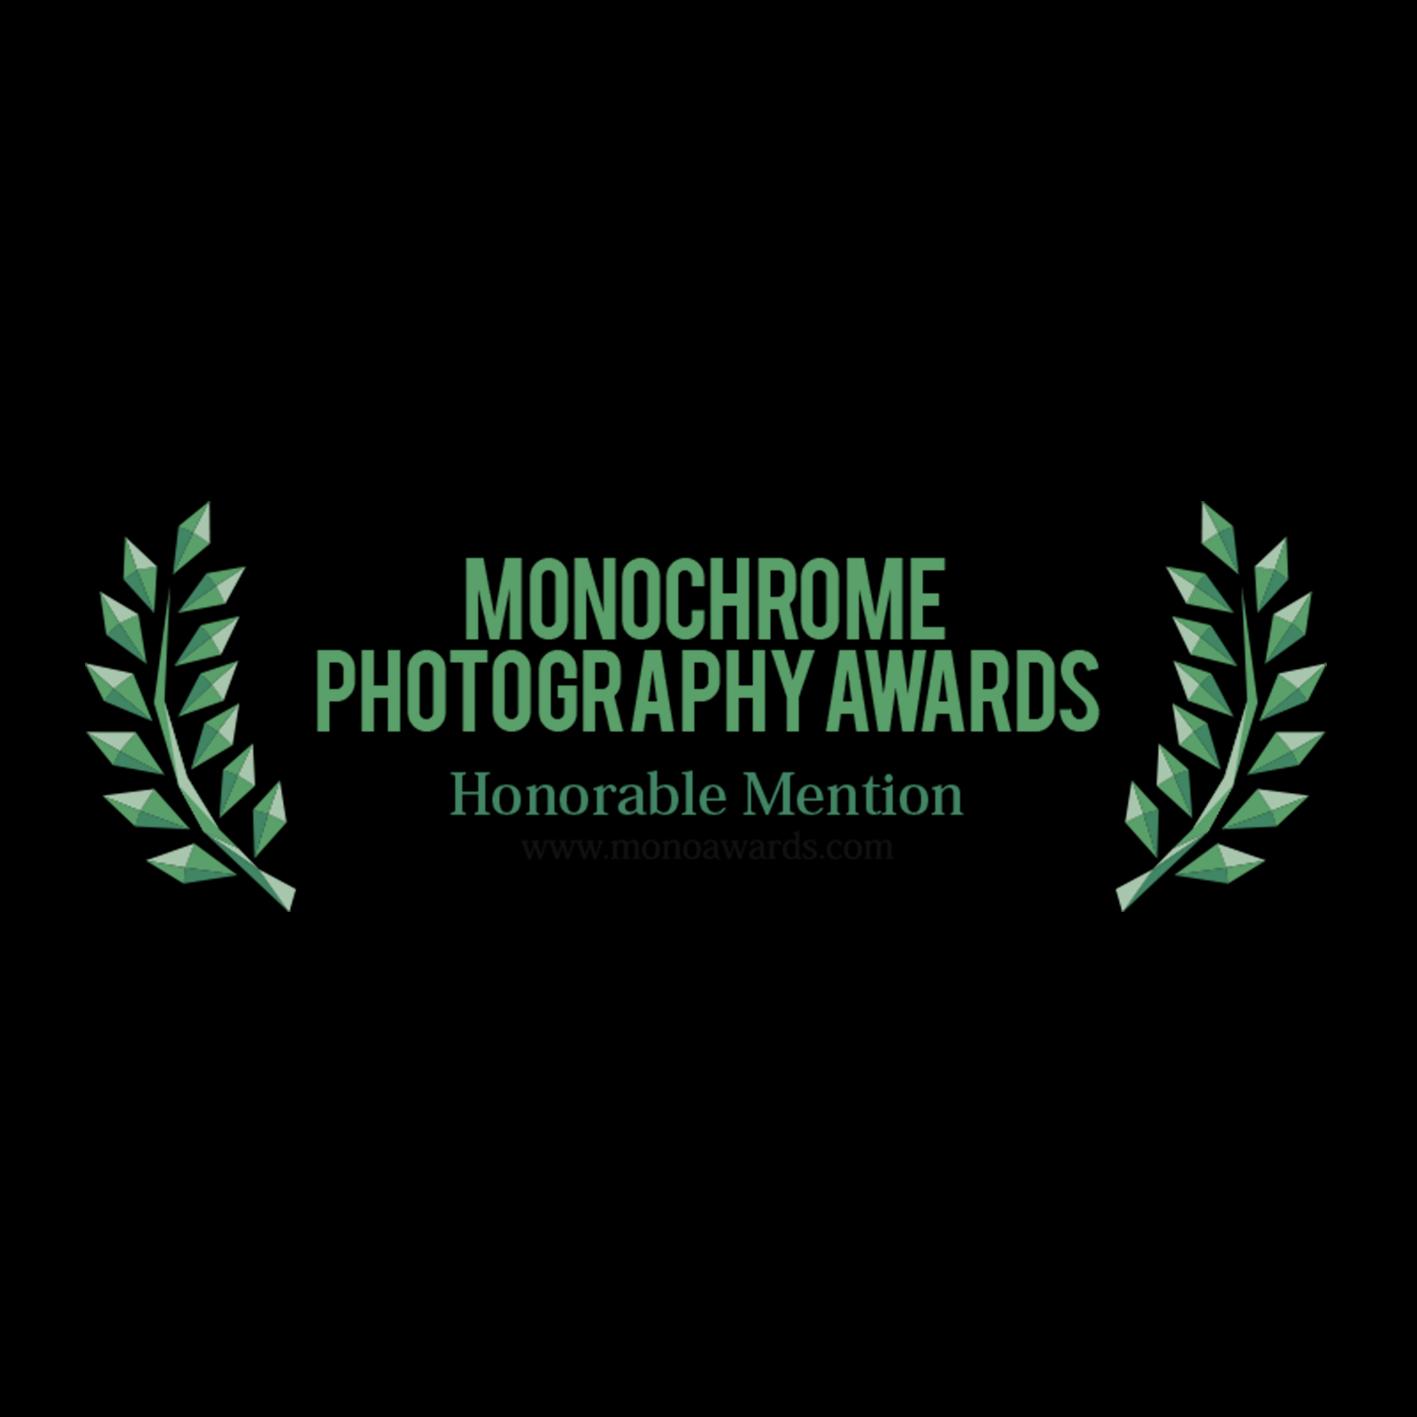 Monochrome photography awards